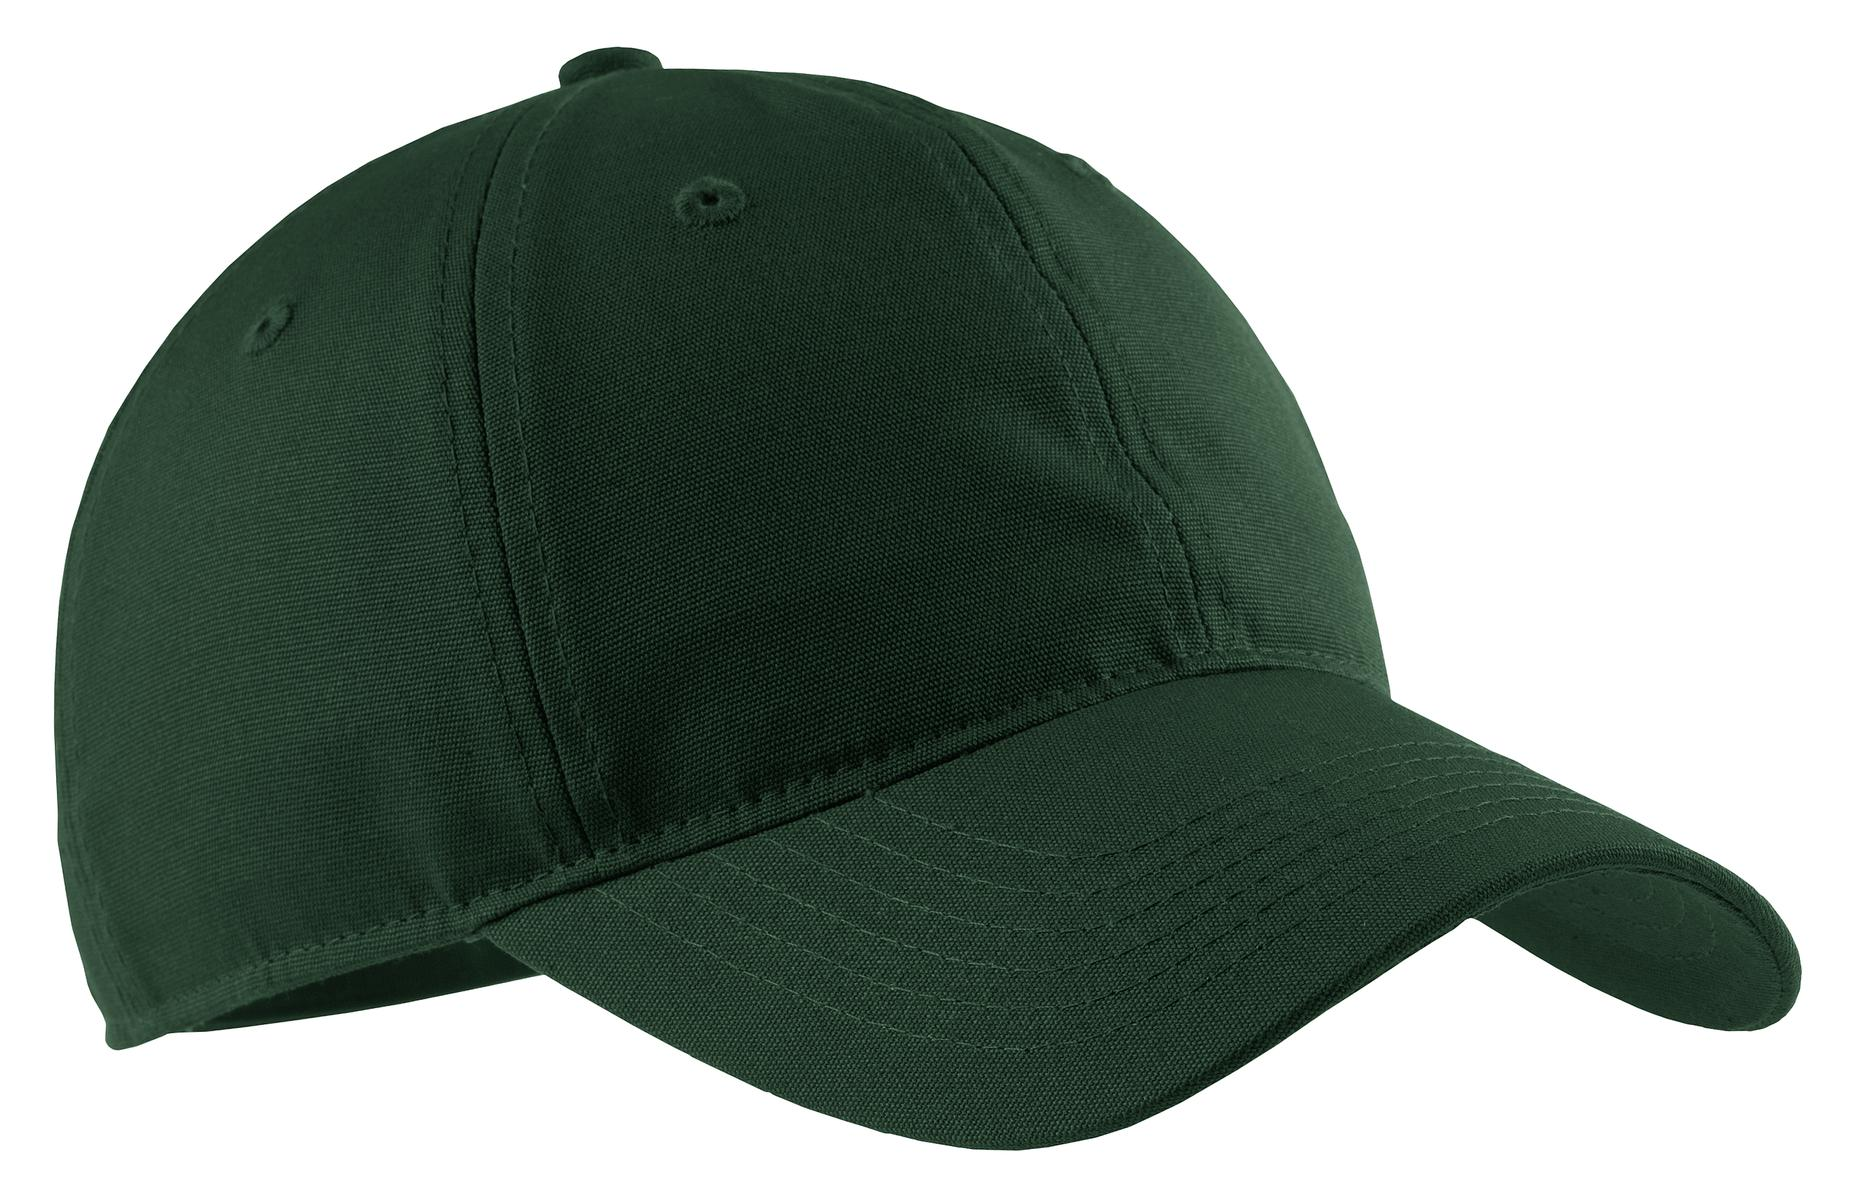 Port & Company® - Soft Brushed Canvas Cap.-Port & Company